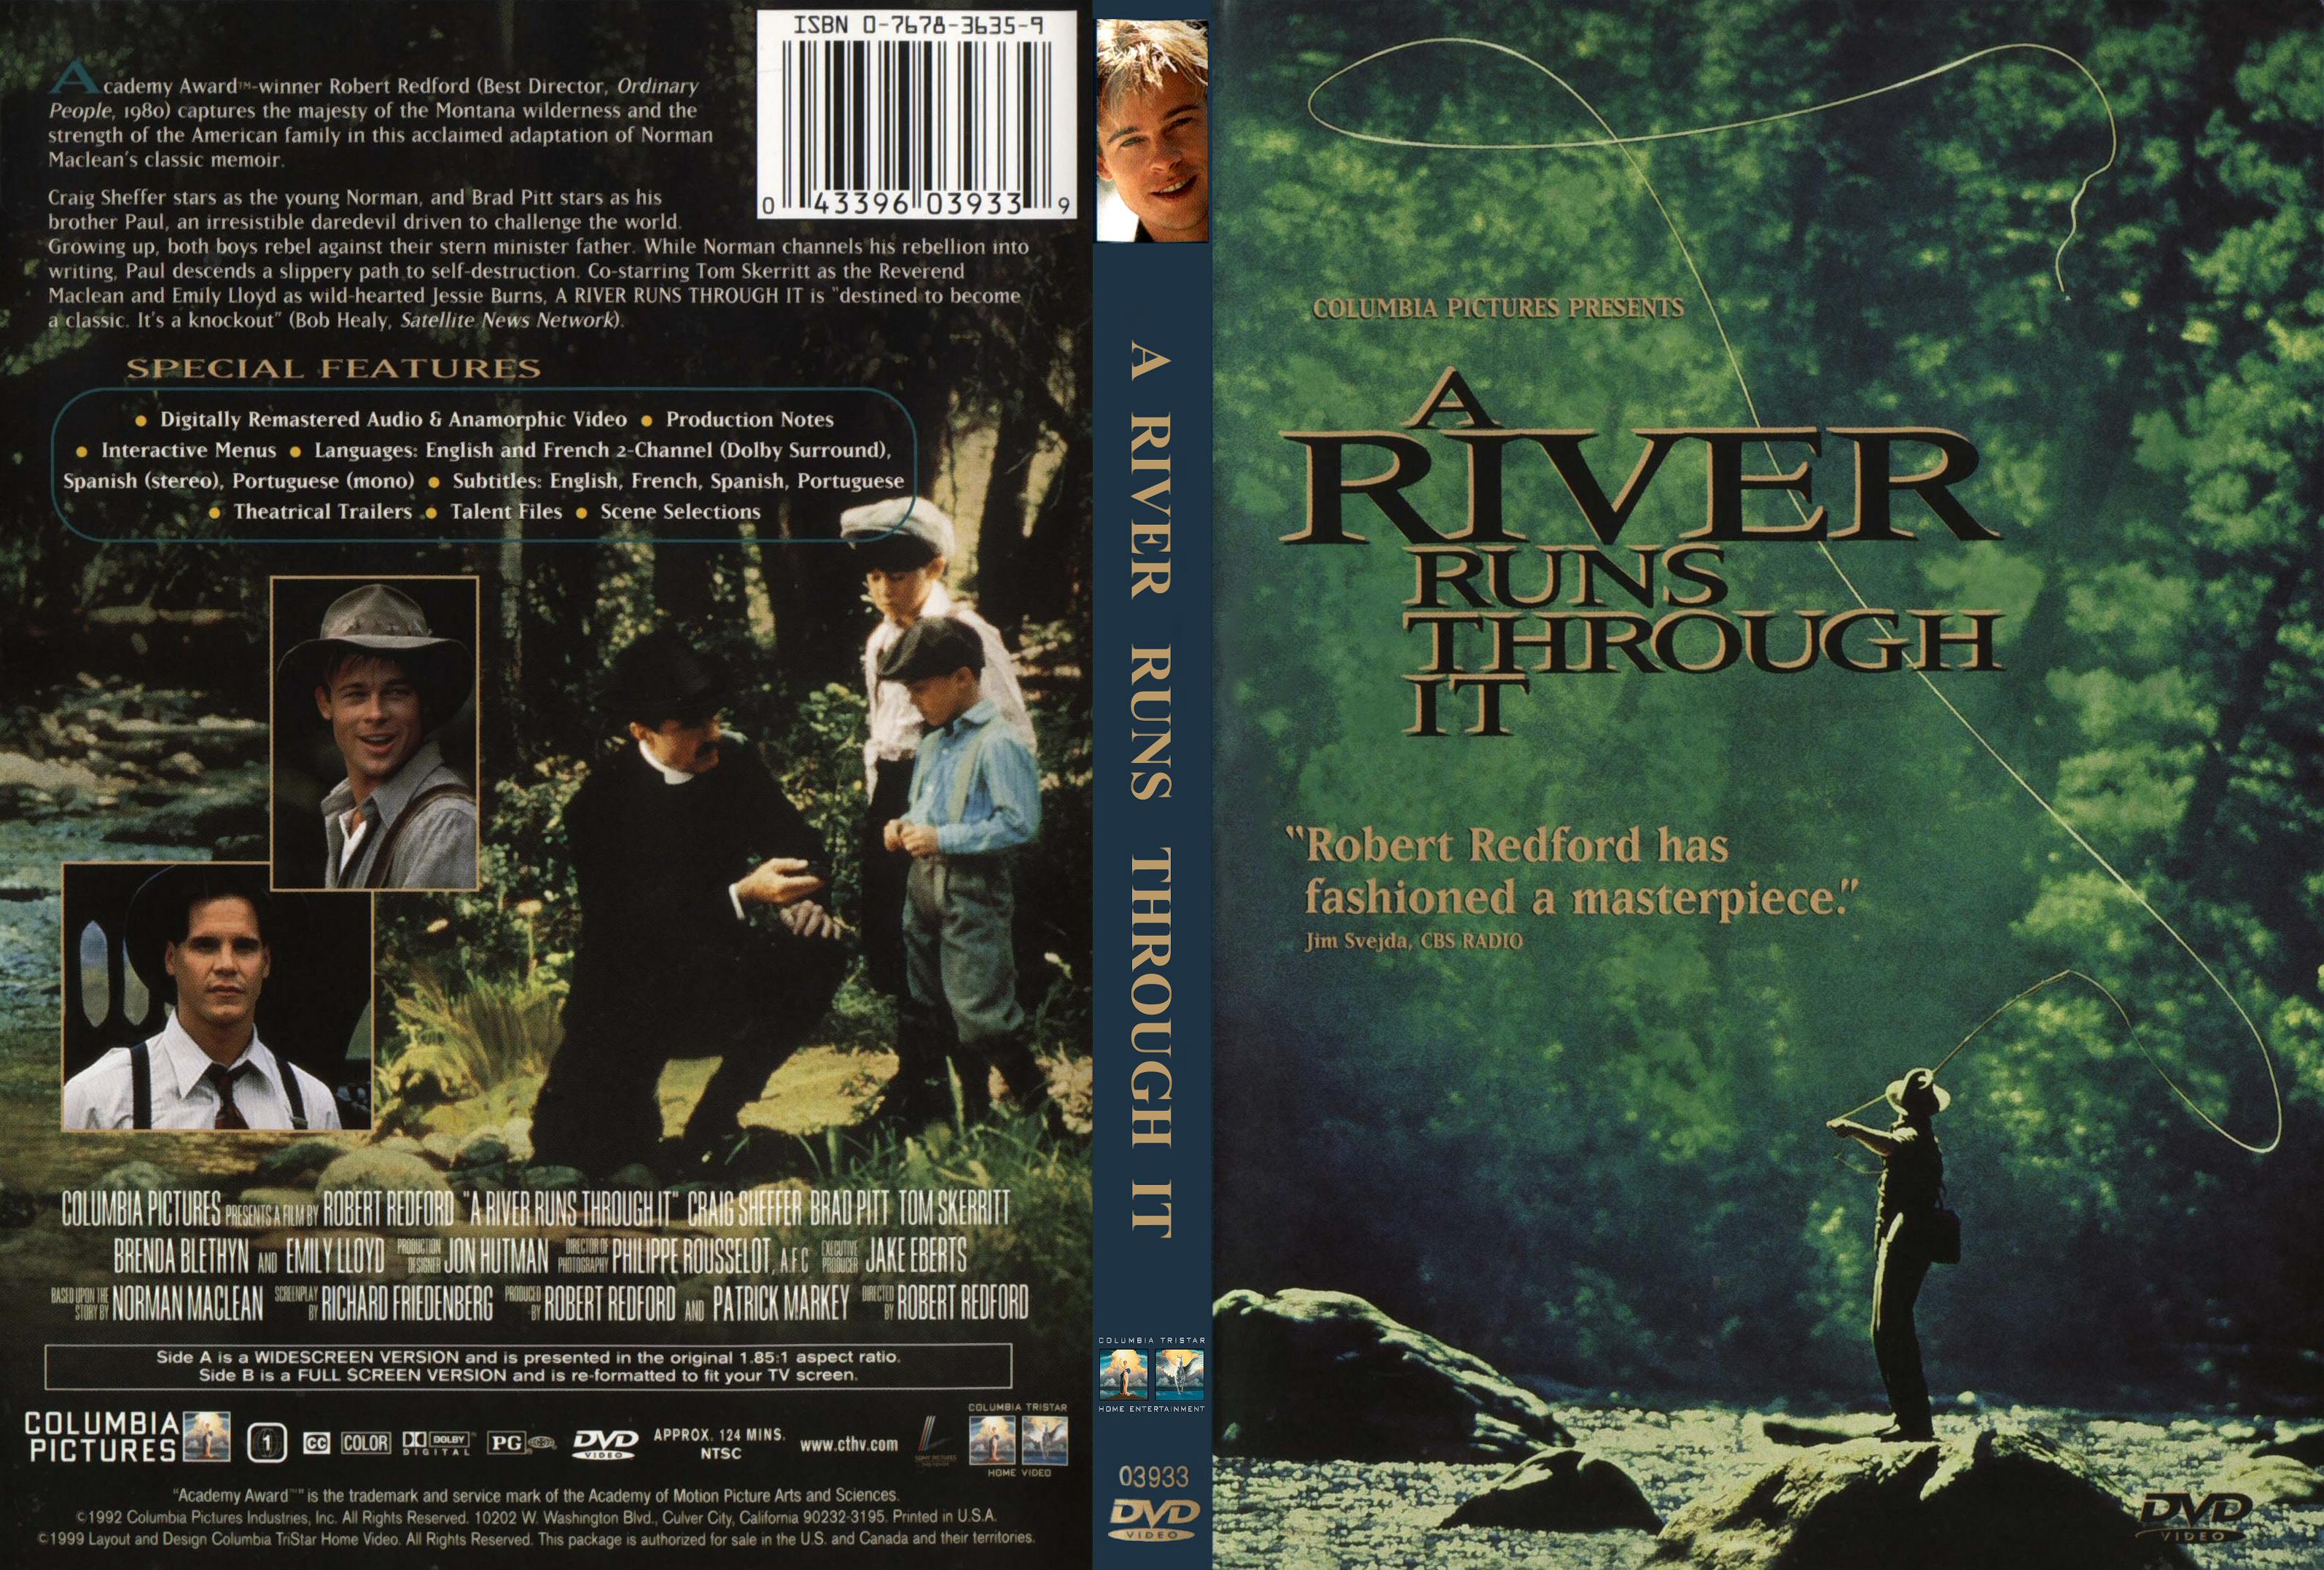 essay on a river runs through it movie